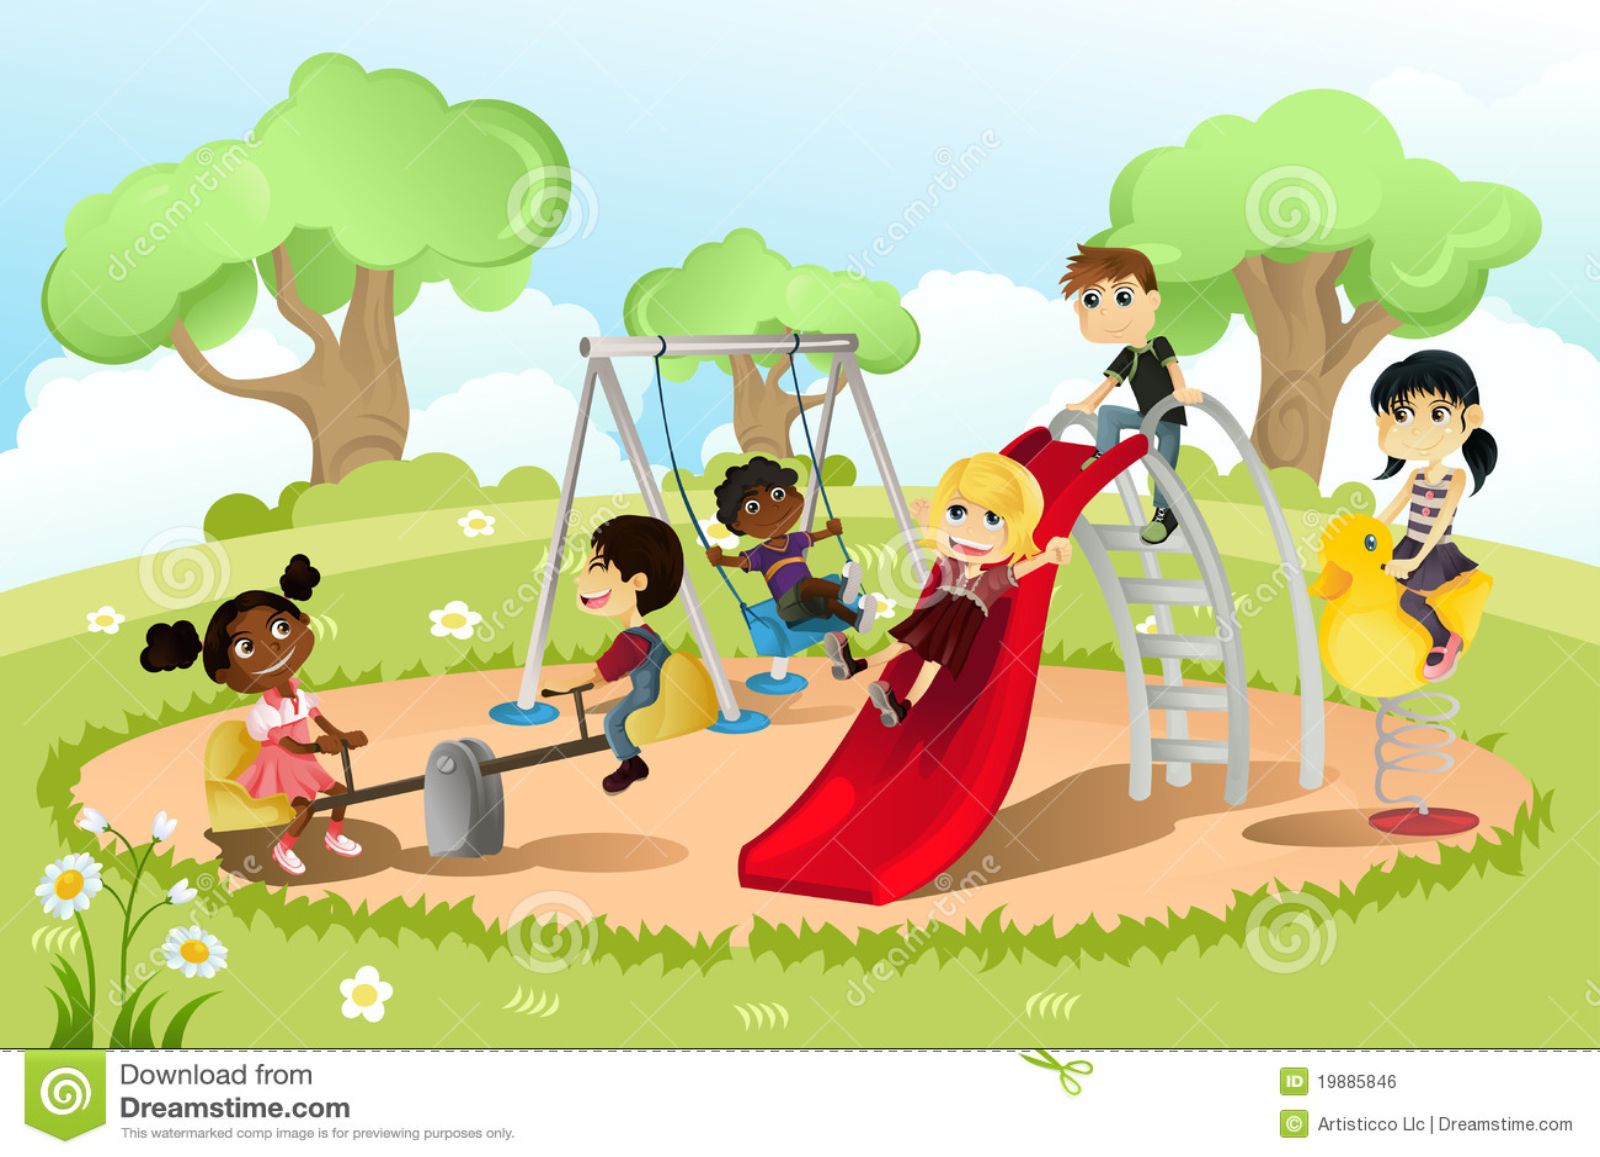 Children in playground stock vector. Illustration of ...